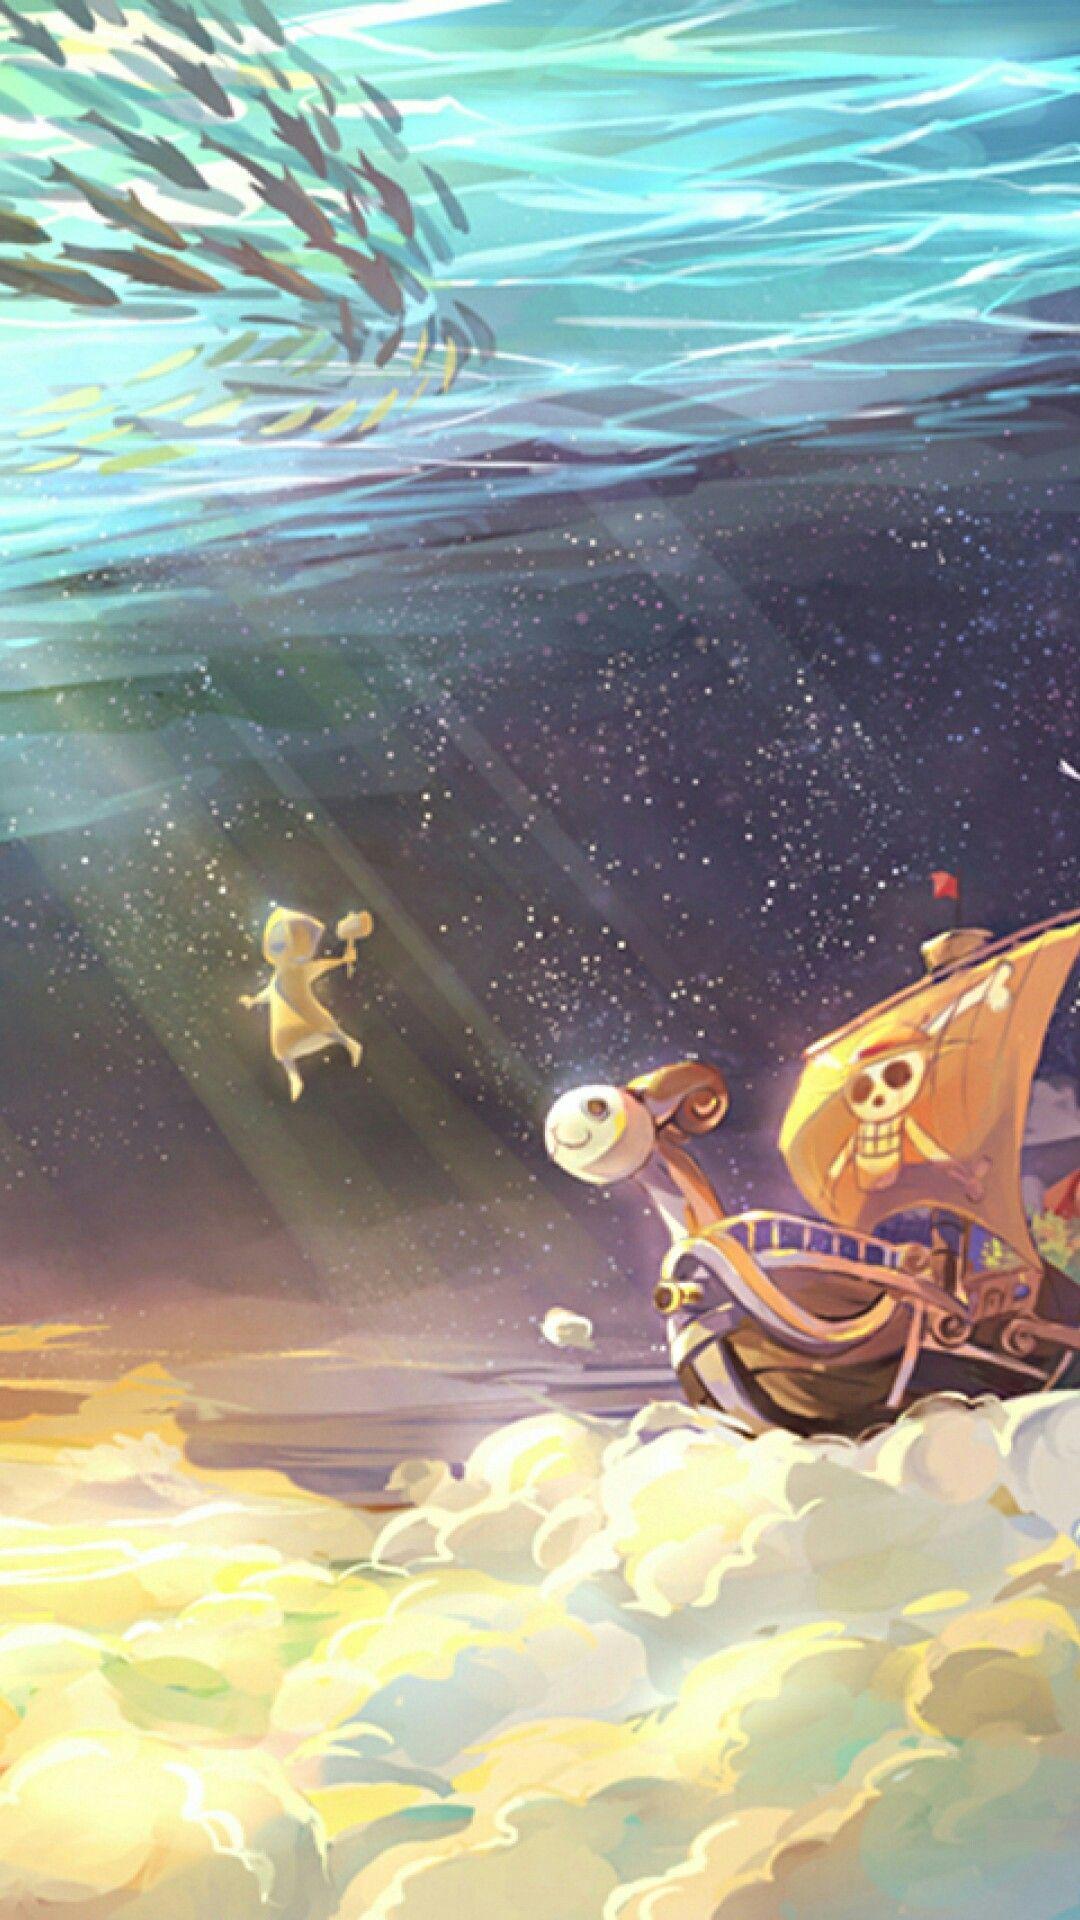 Going Merry Y Klabautermann One Piece Skypiea ルフィ イラスト ルフィ 画像 壁紙 アニメ